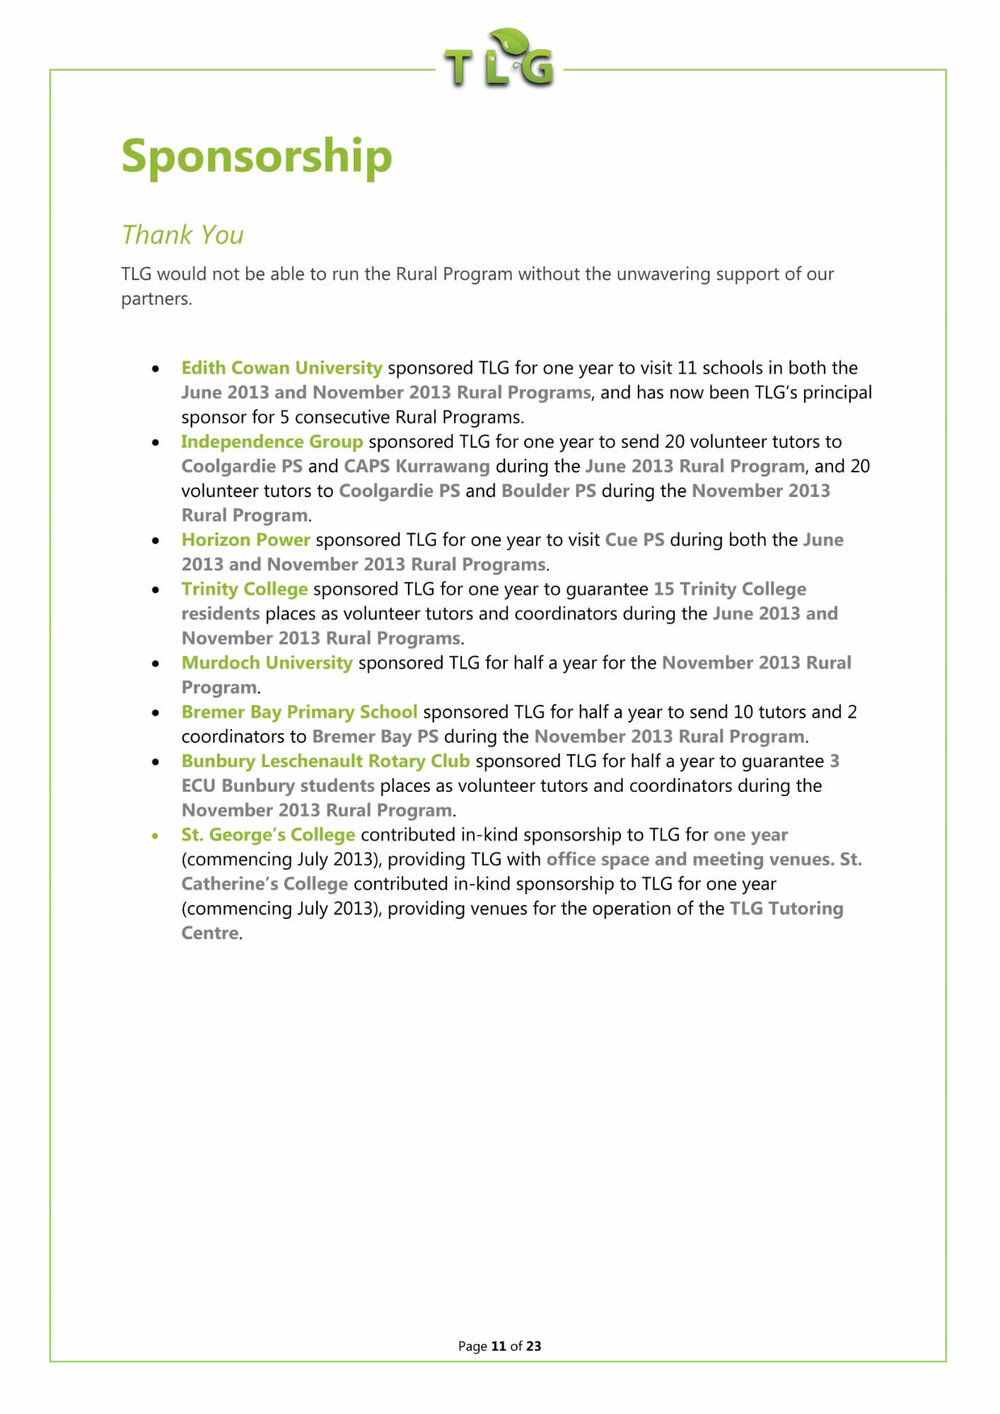 tlg-annual-report-FY13-11.jpg